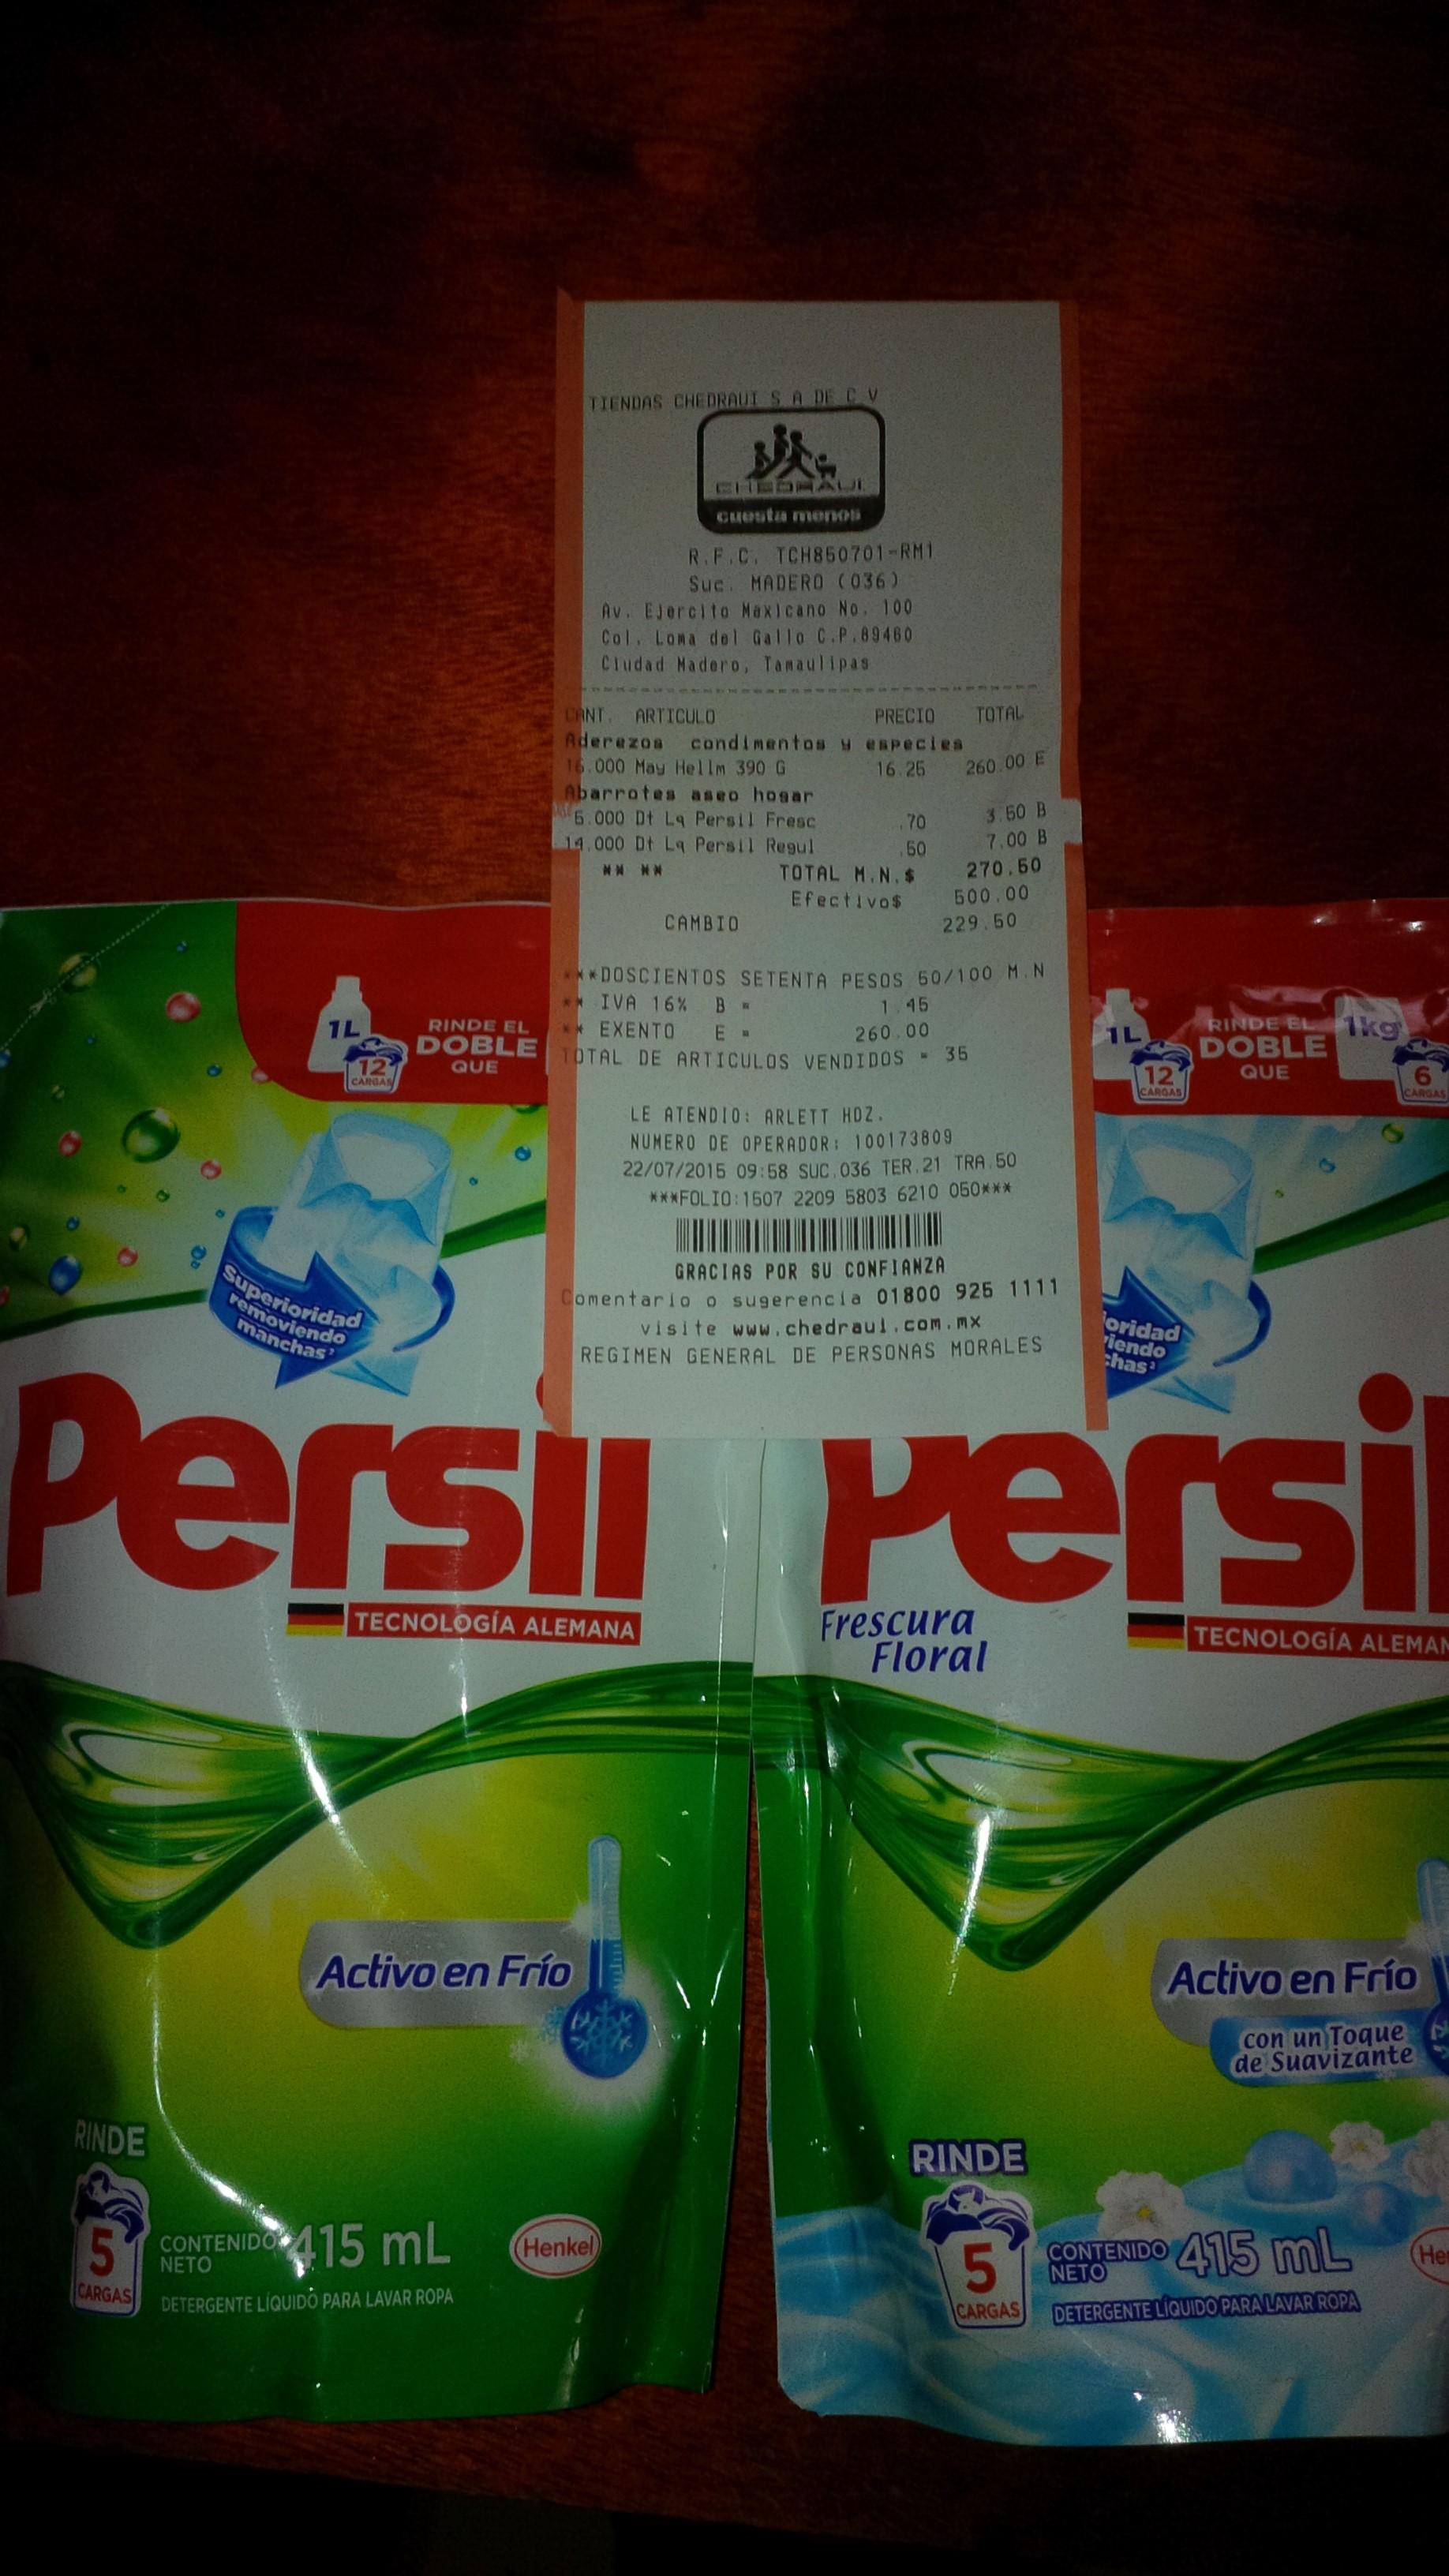 Chedraui: Detergente Persil 415 ml $0.50